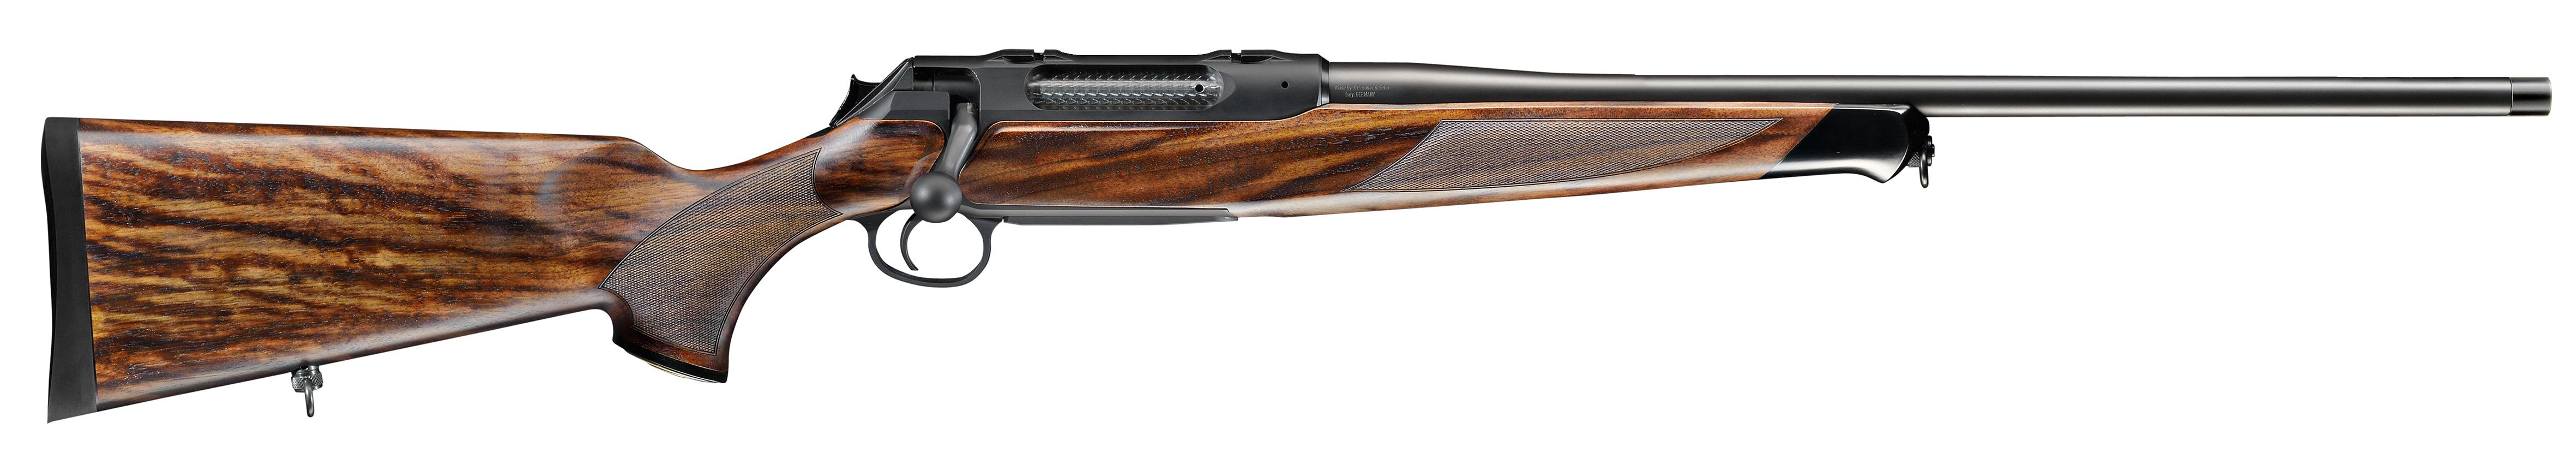 Sauer 404 Select SR 9,3x62 kivääri